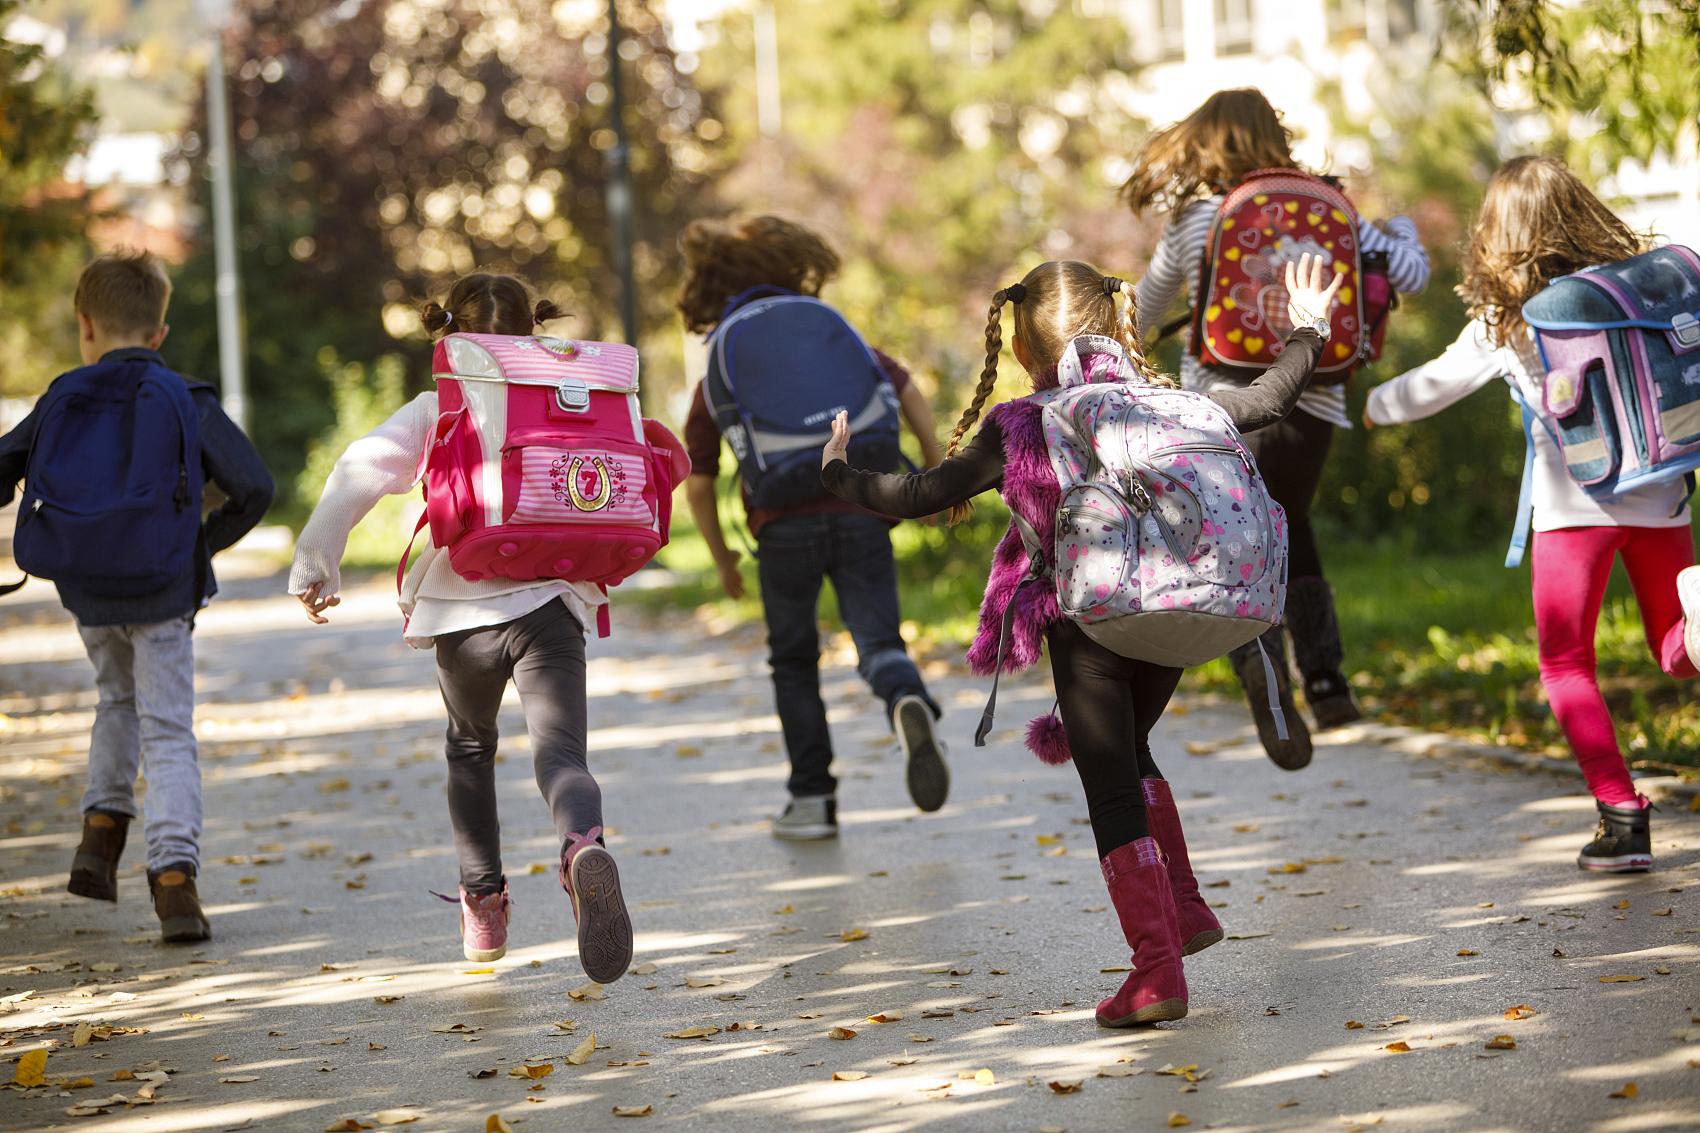 China Focus: Millions of students back to school as coronavirus retreats in China